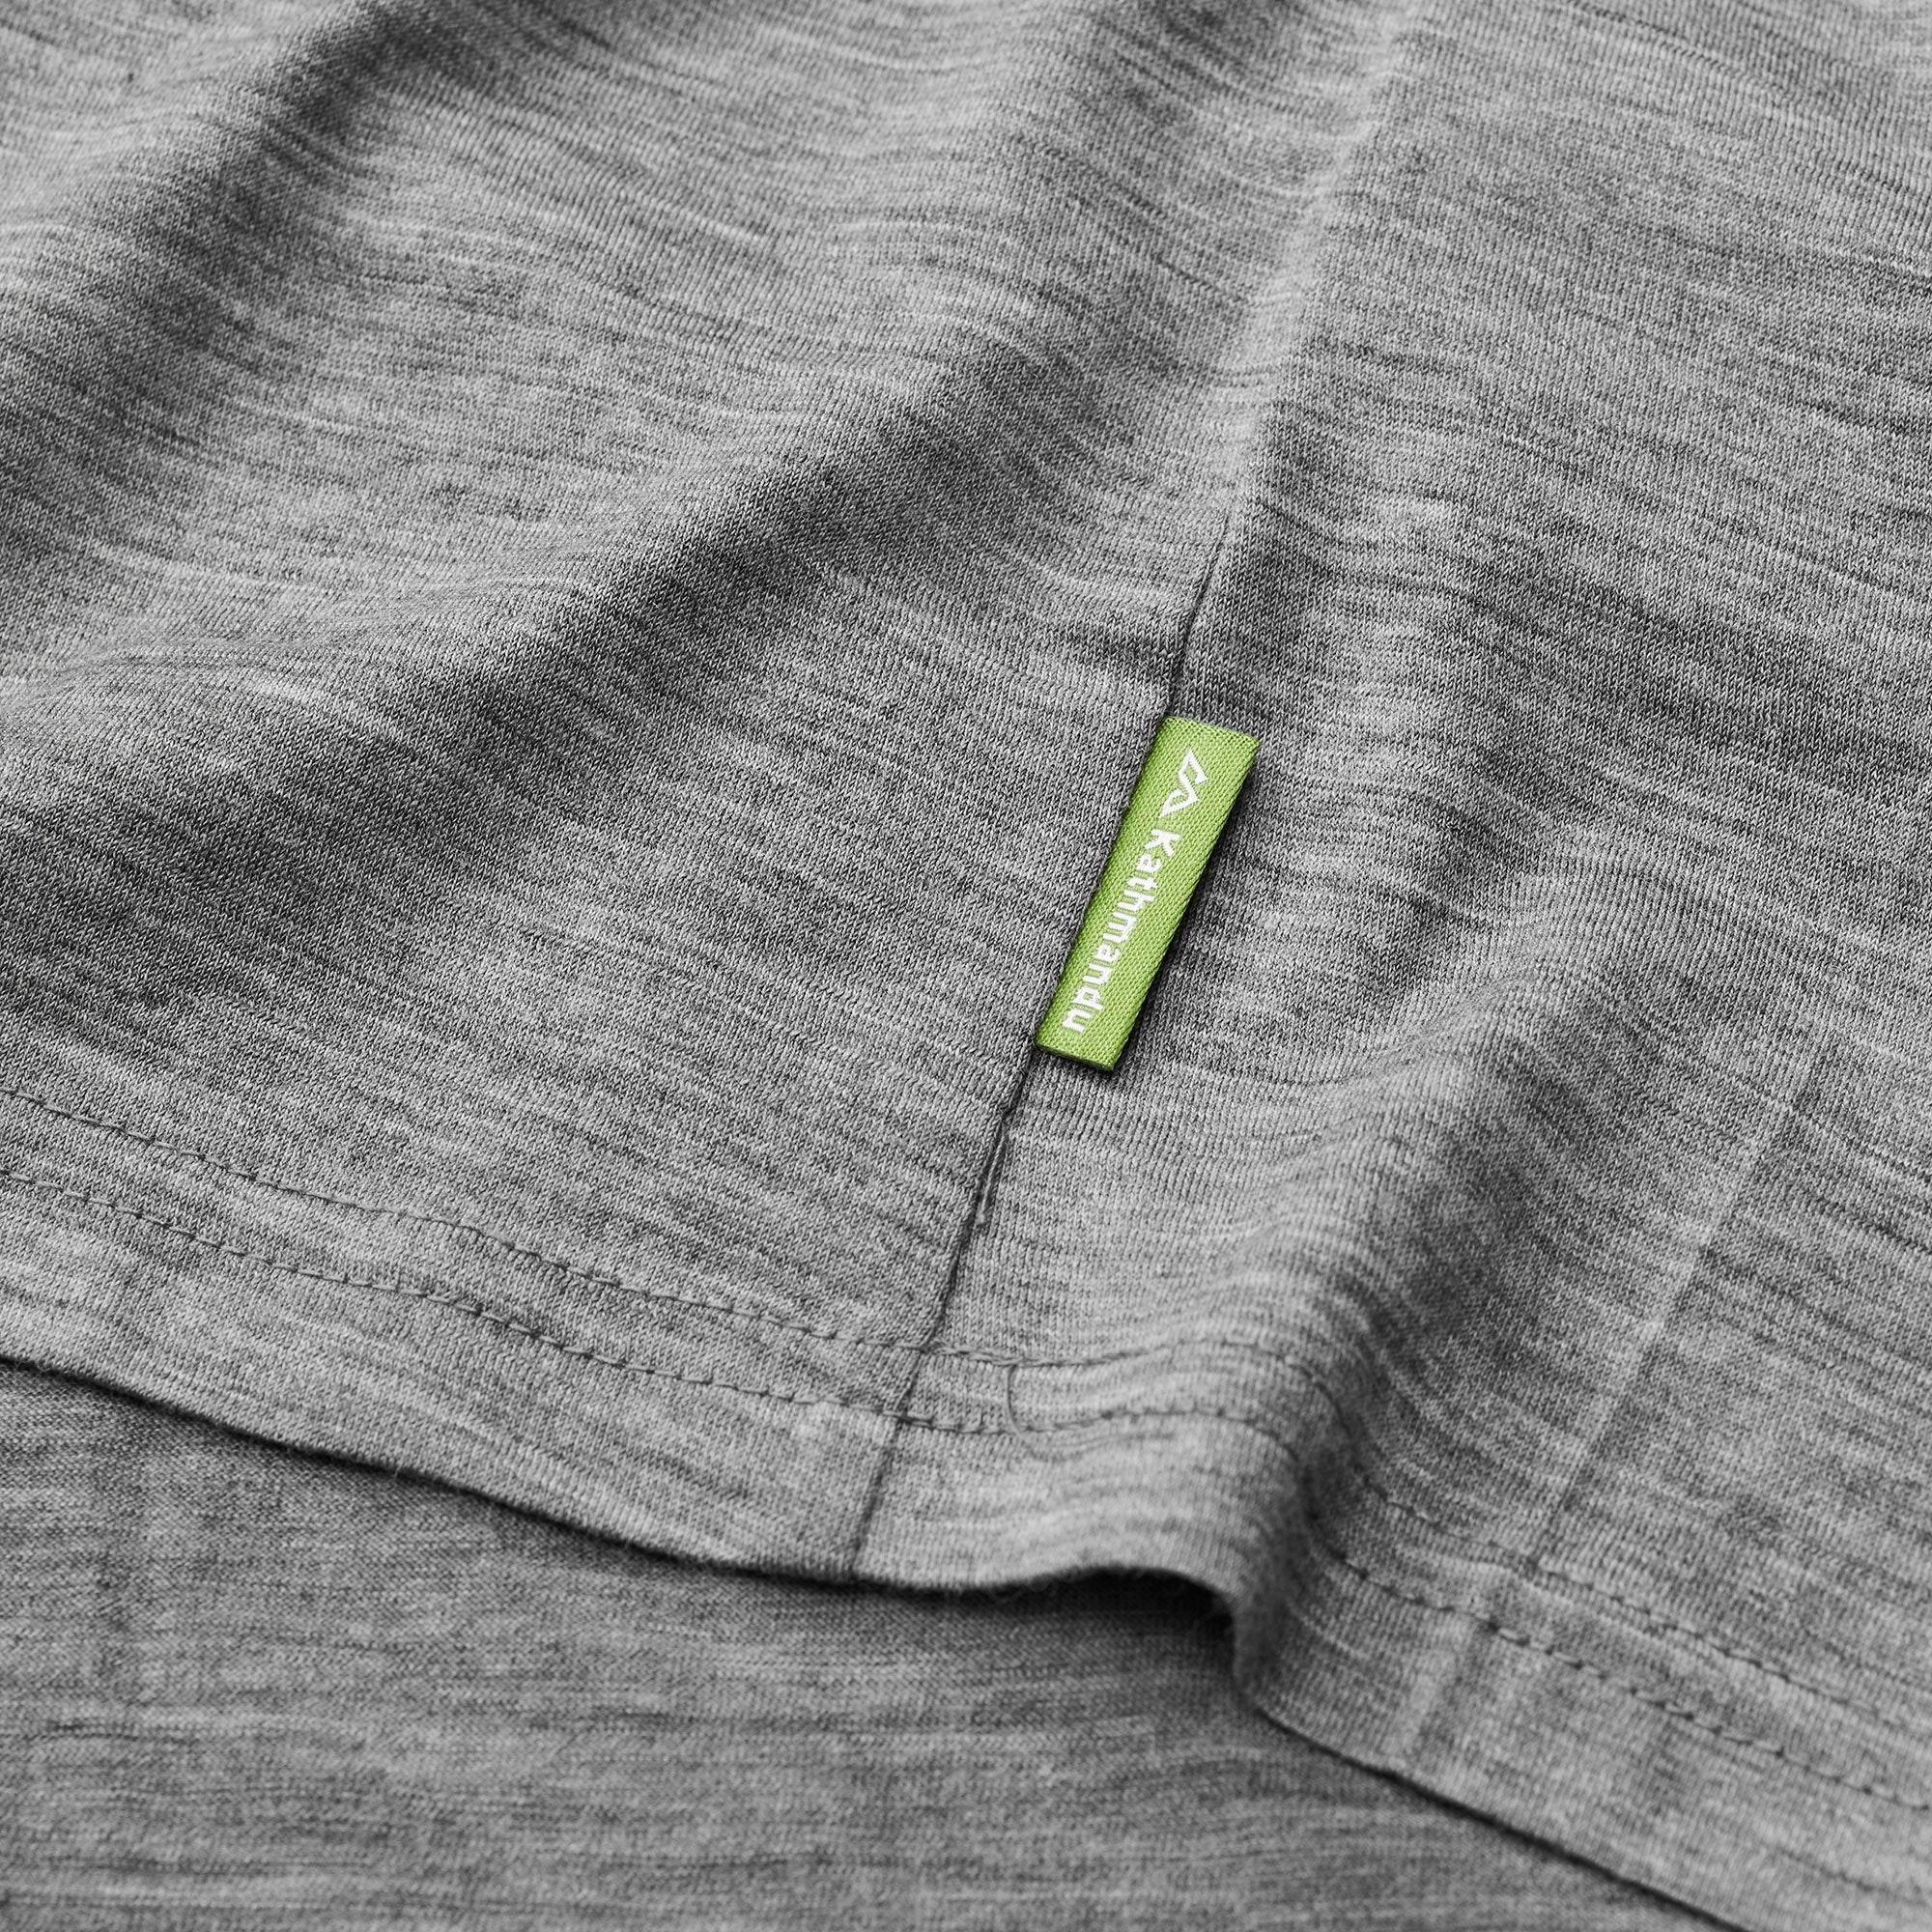 thumbnail 19 - NEW Kathmandu Core Spun Merino Wool Blend Short Sleeve Durable Men's Crew Top